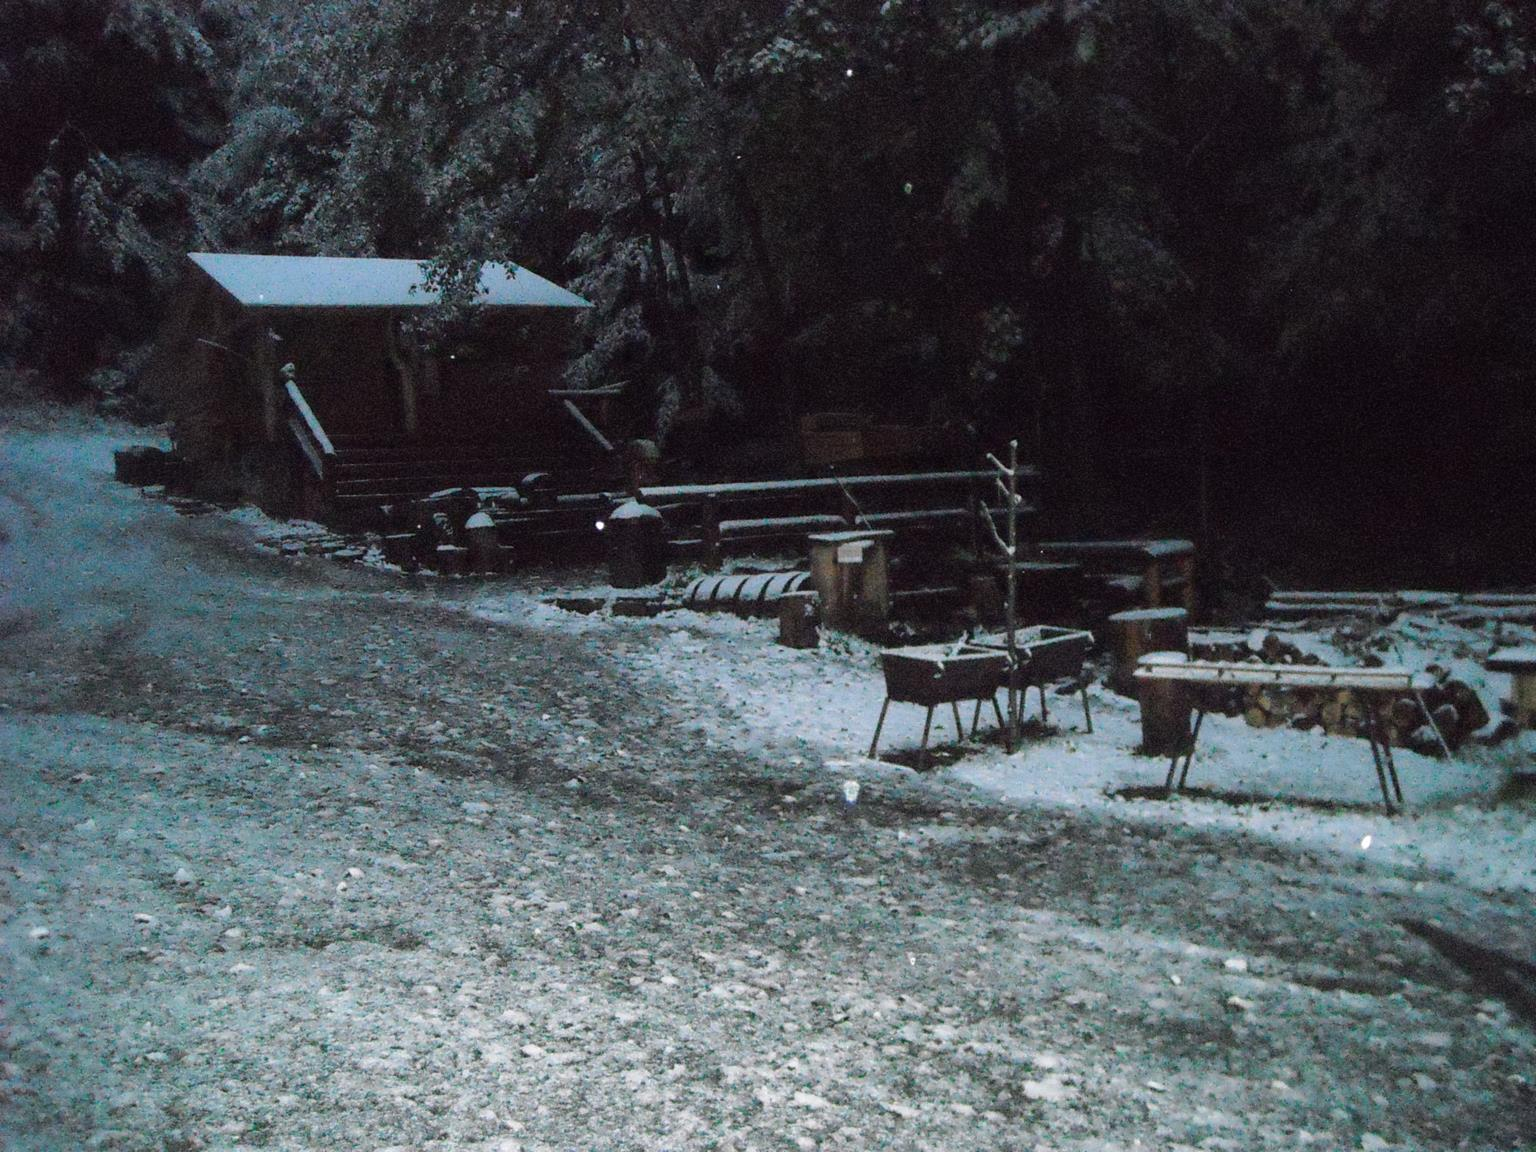 Lesní bar v roku 2009, zdroj: zdroj: lesnibar.wordpress.com